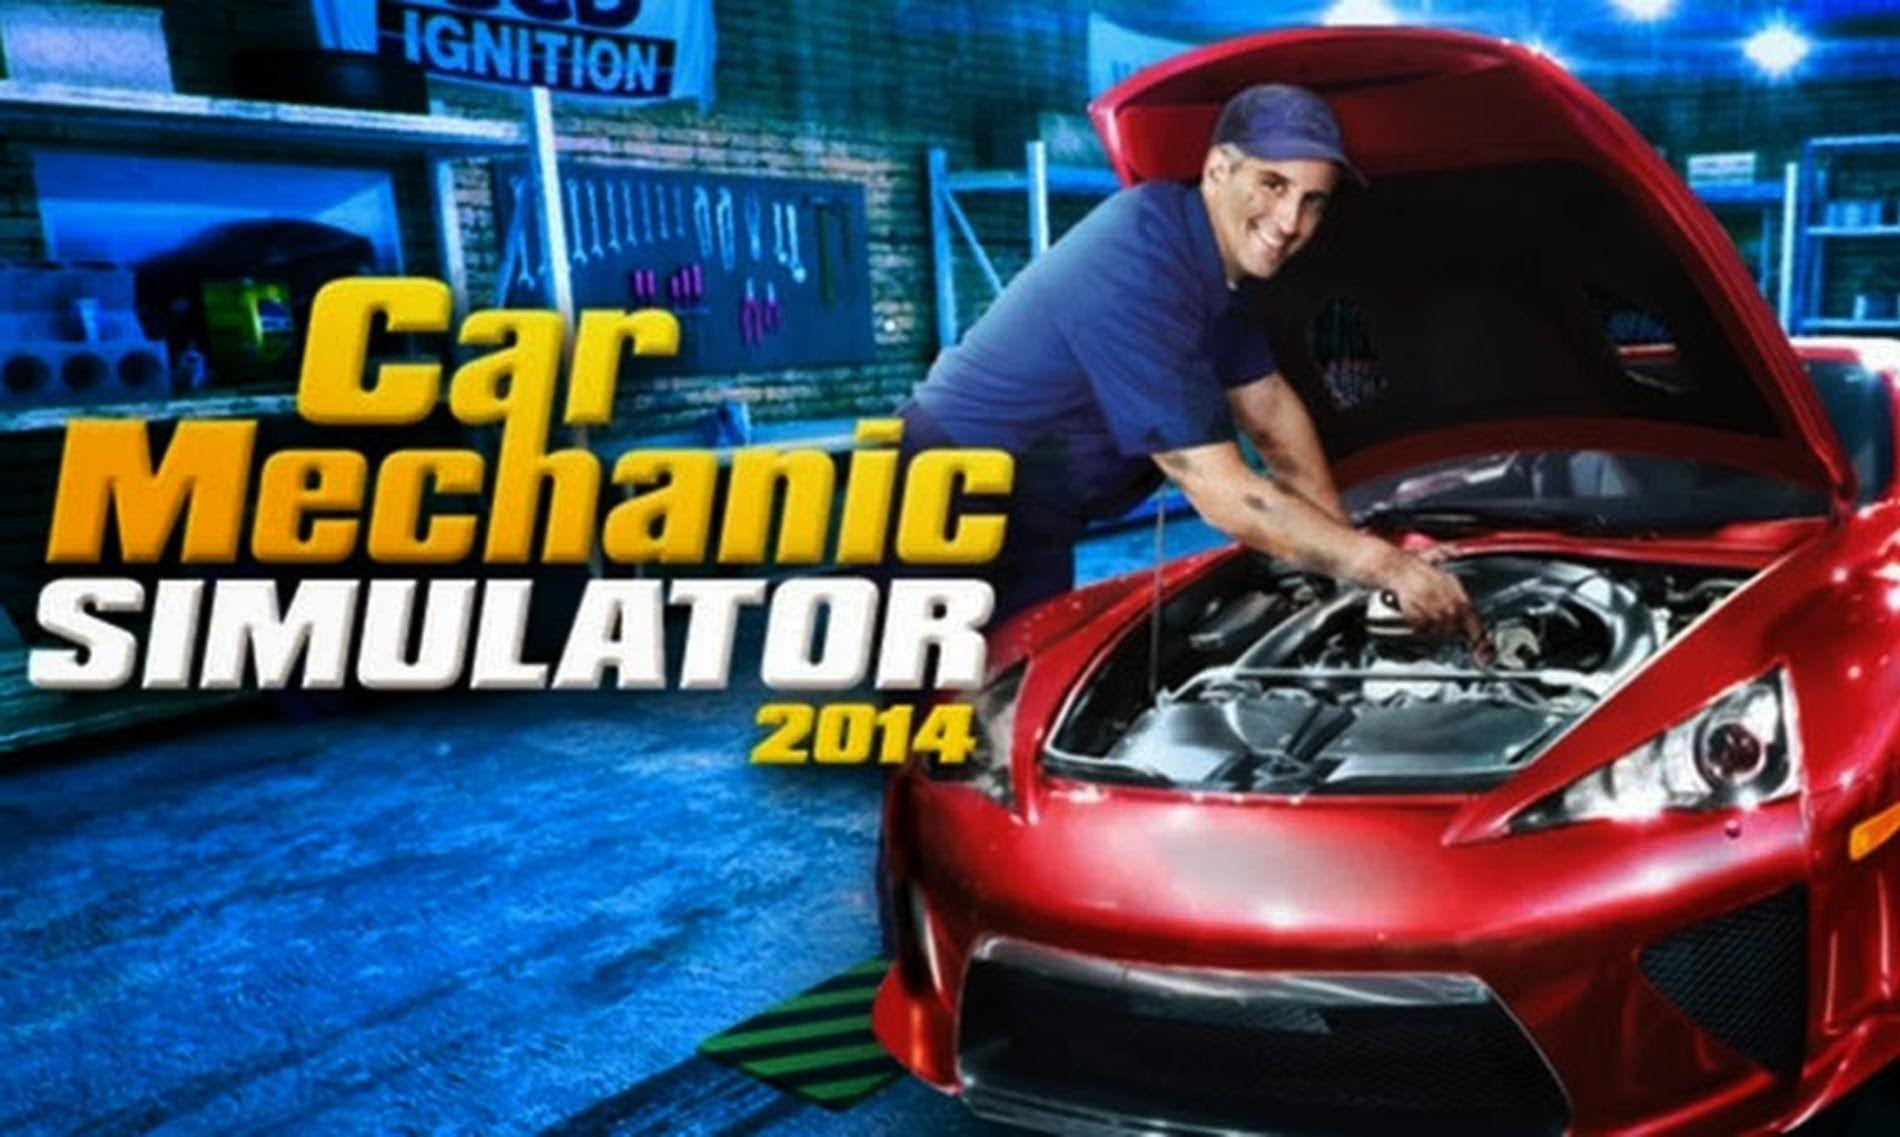 Let's Play Car Mechanic Simulator Car mechanic